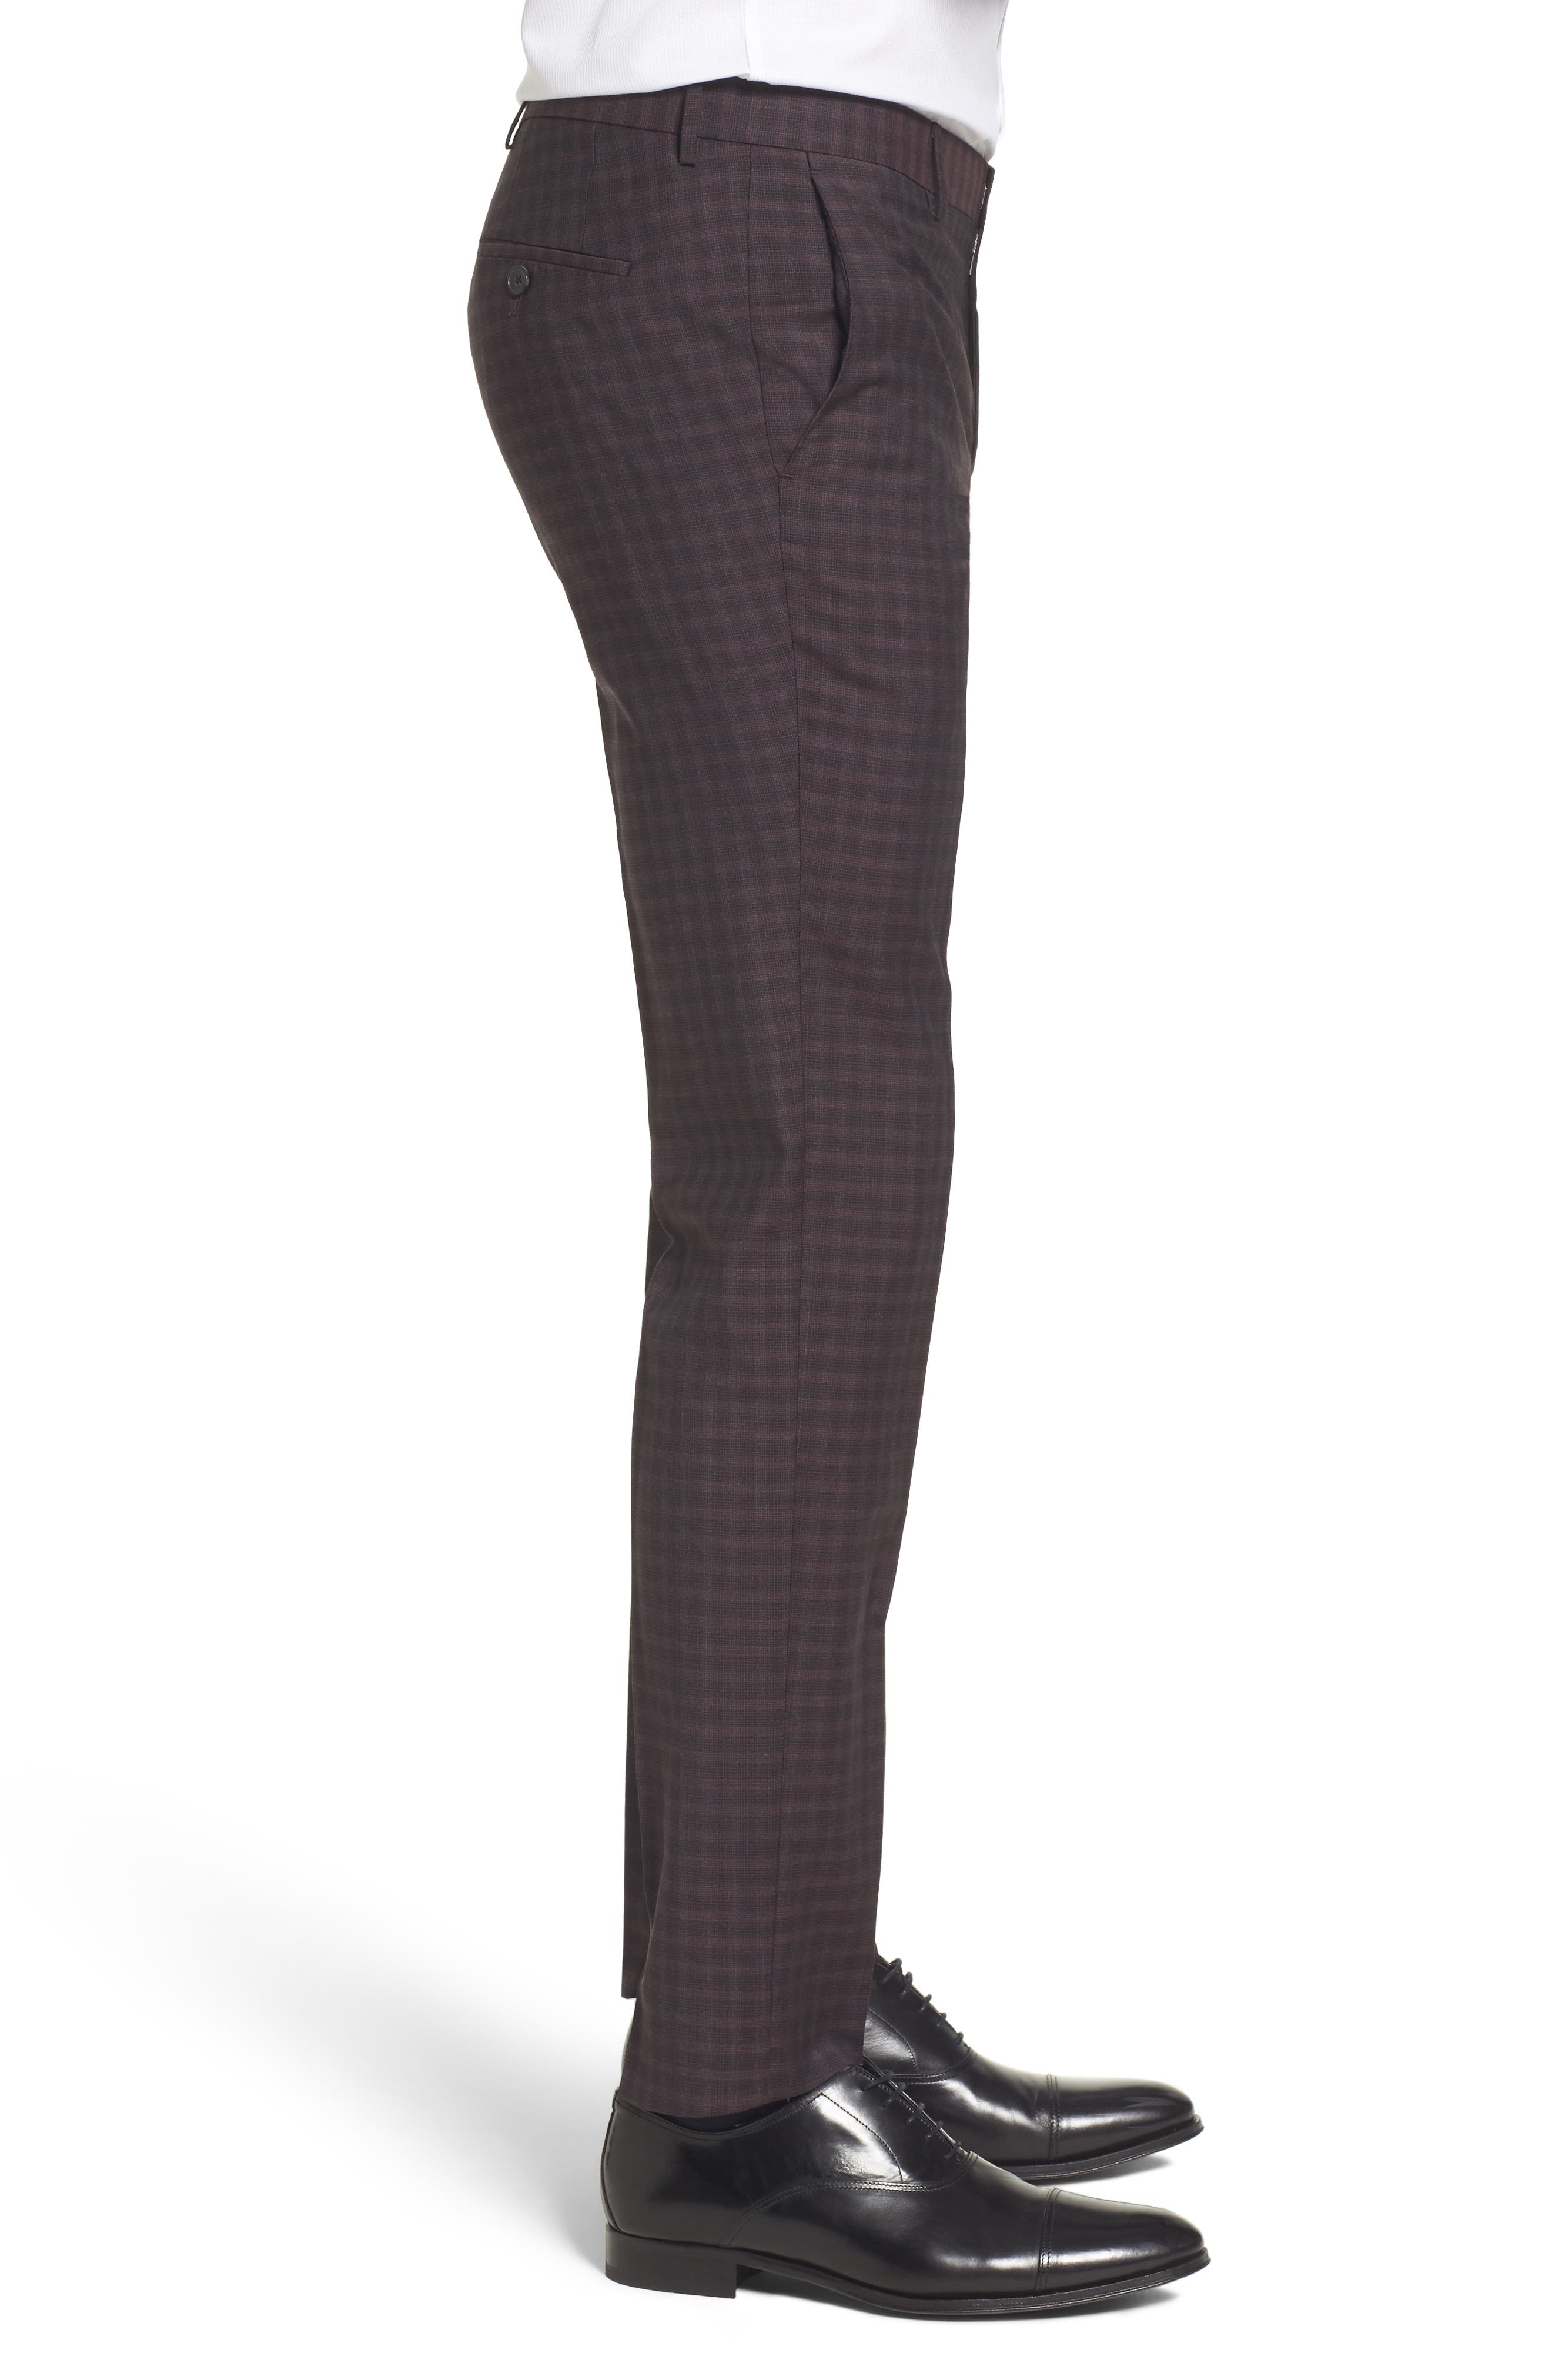 Benso Regular Fit Wool Trousers,                             Alternate thumbnail 3, color,                             Dark Red